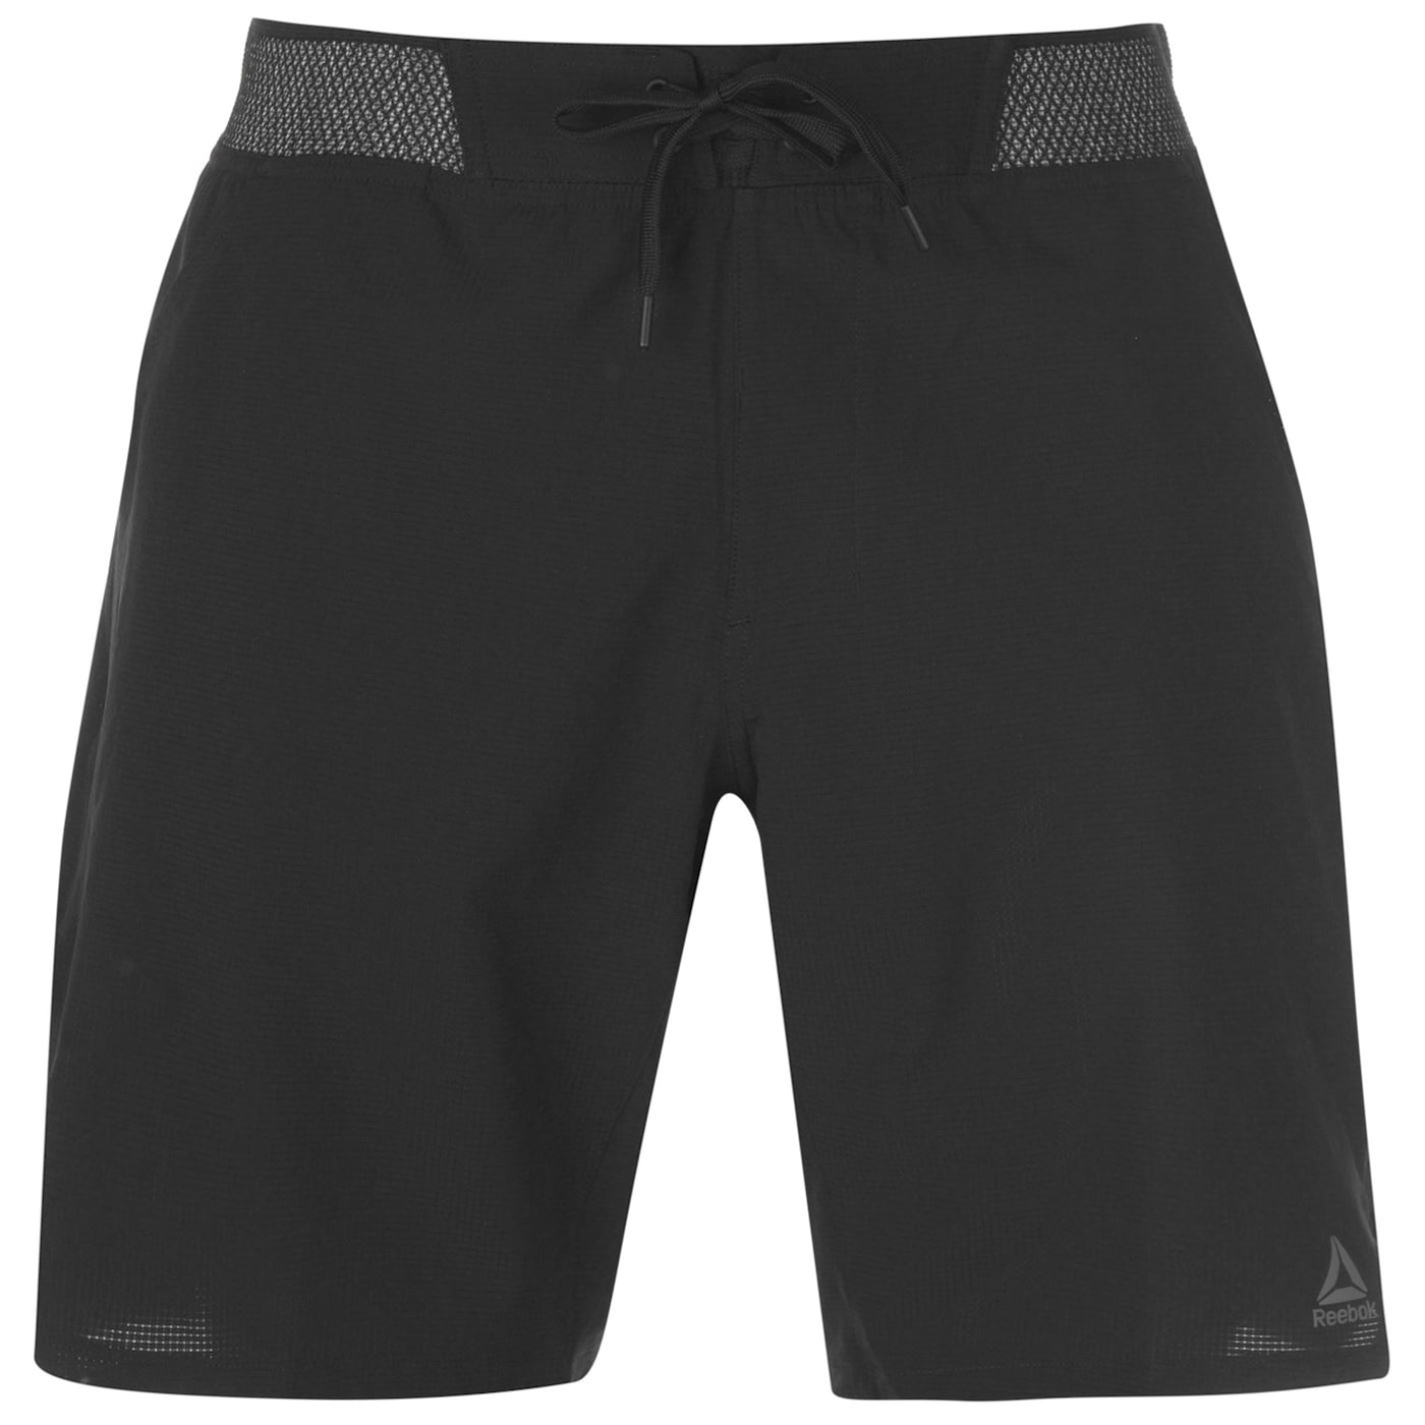 Reebok Epic Knit Shorts Mens